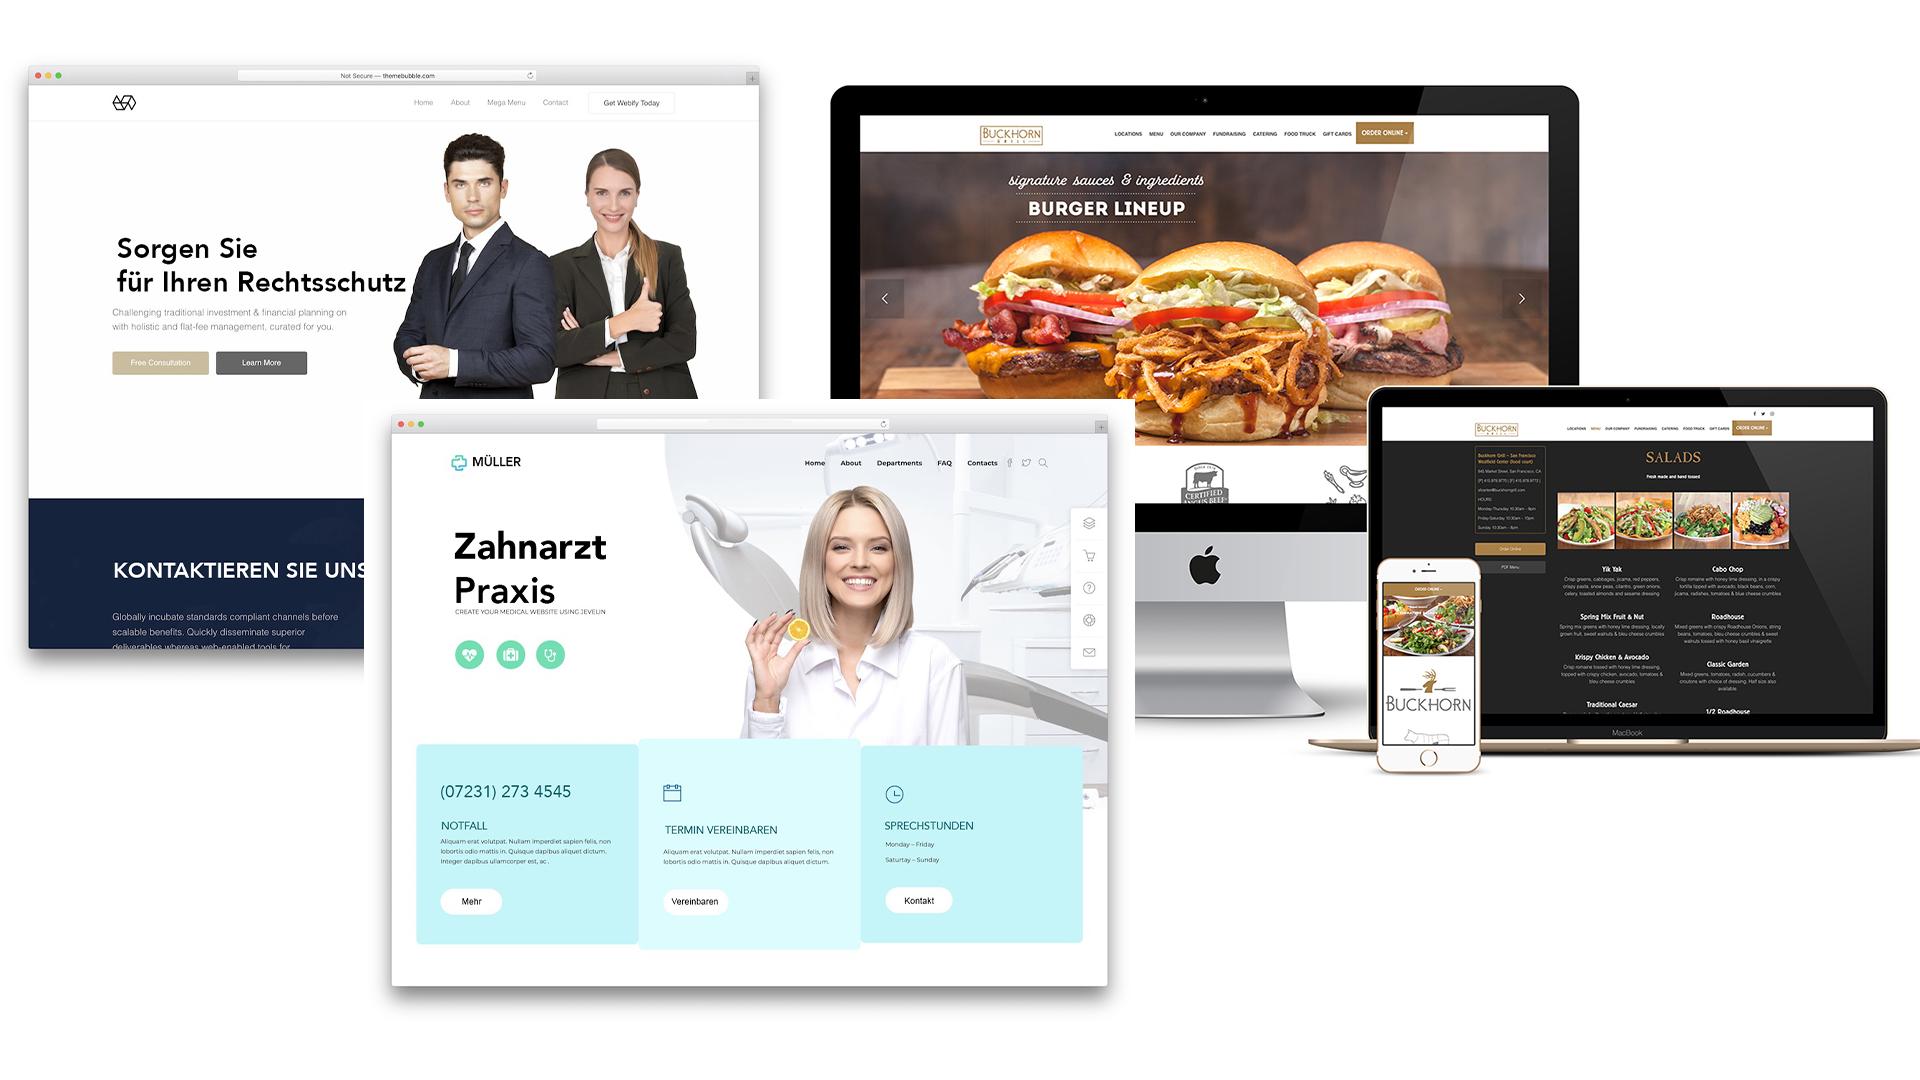 professionelle website erstellen lassen tancomedia digitalagentur